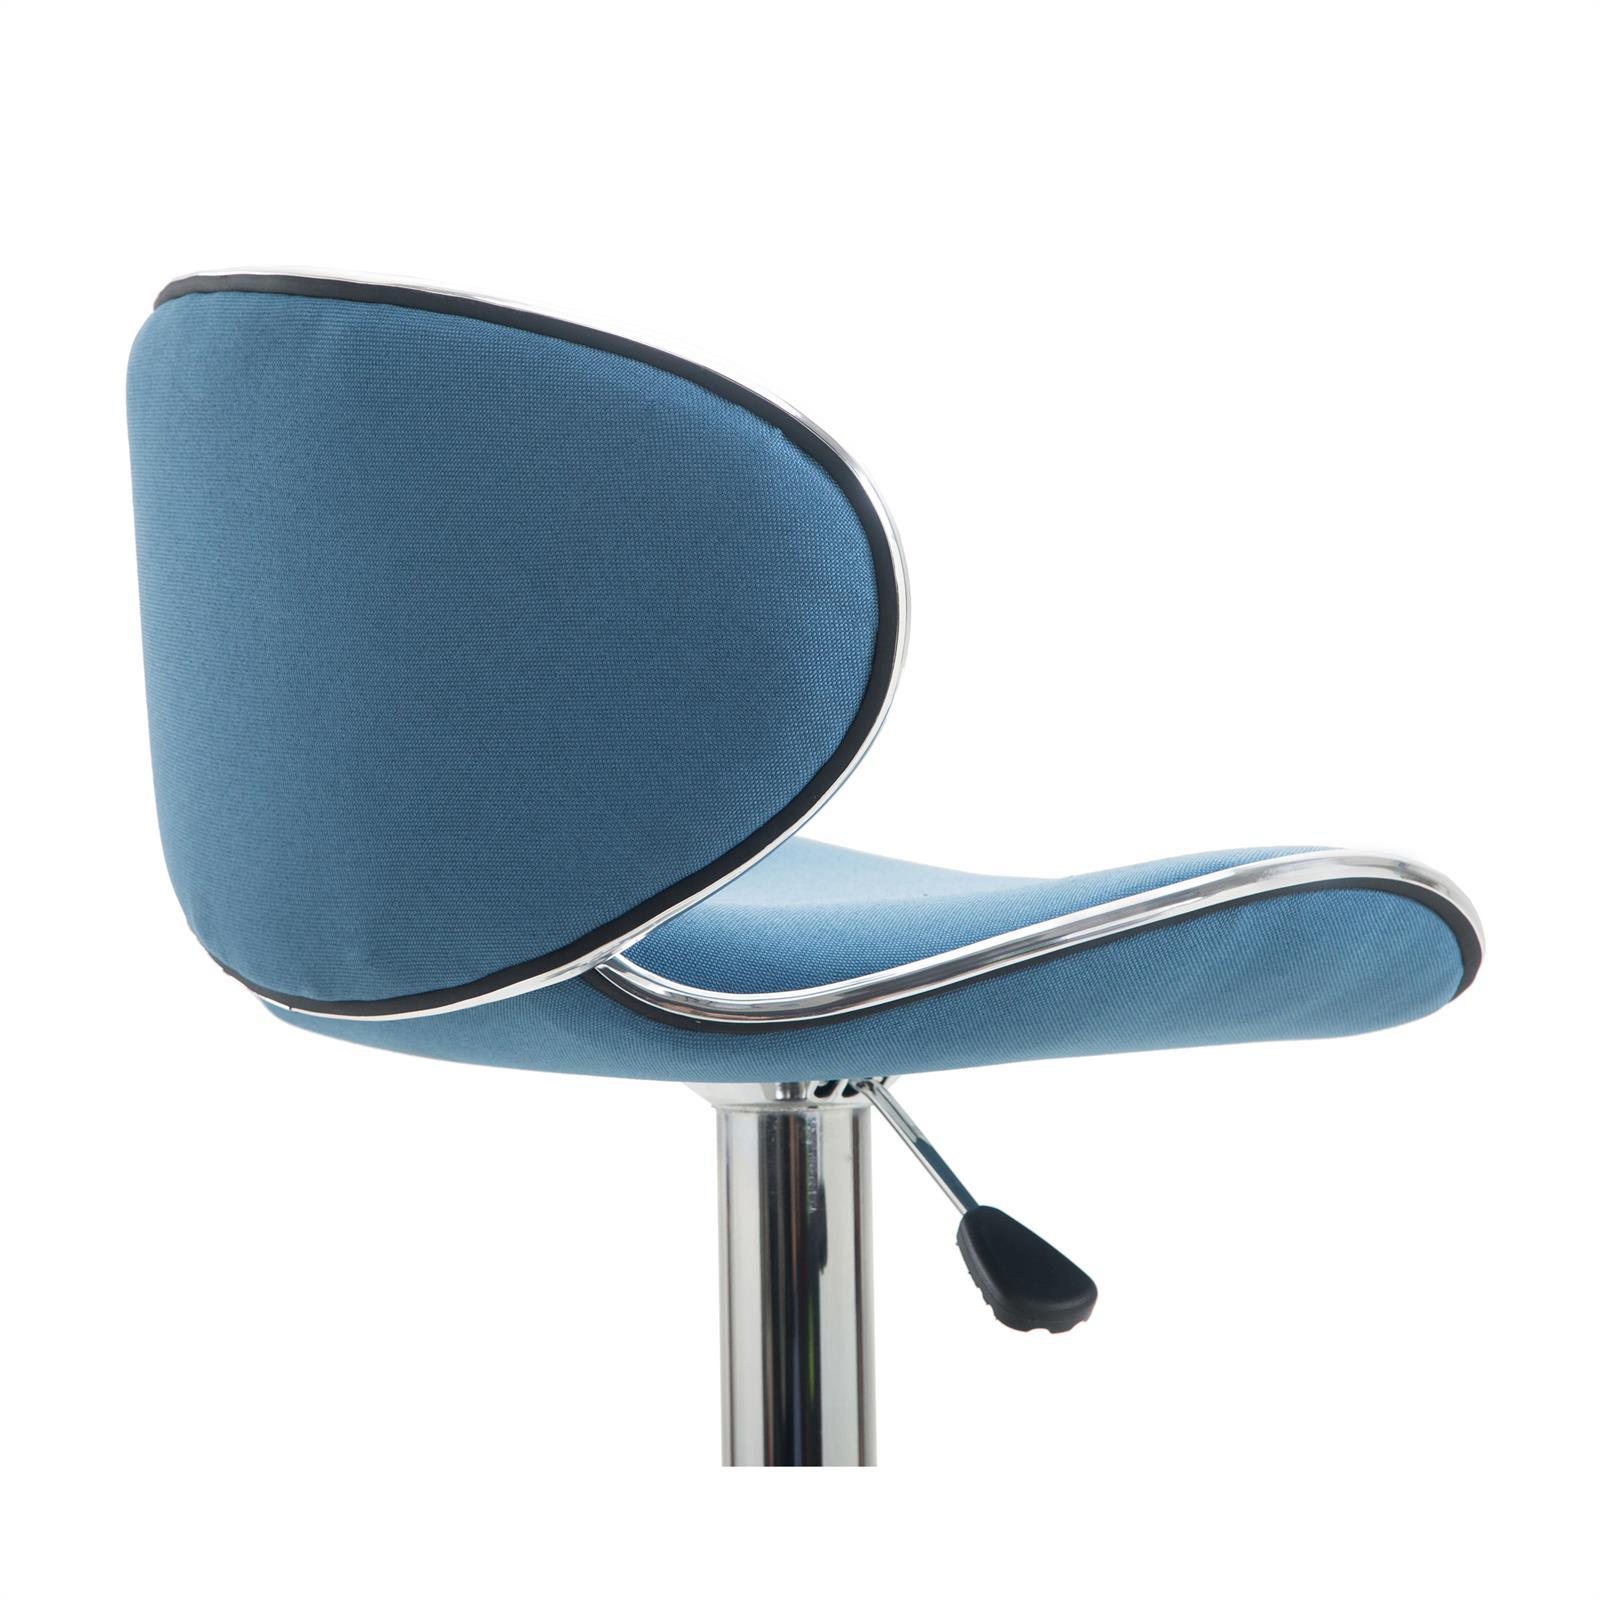 Barhocker lounge mit stoffbezug blau im 2er pack mobilia24 for Barhocker stoffbezug